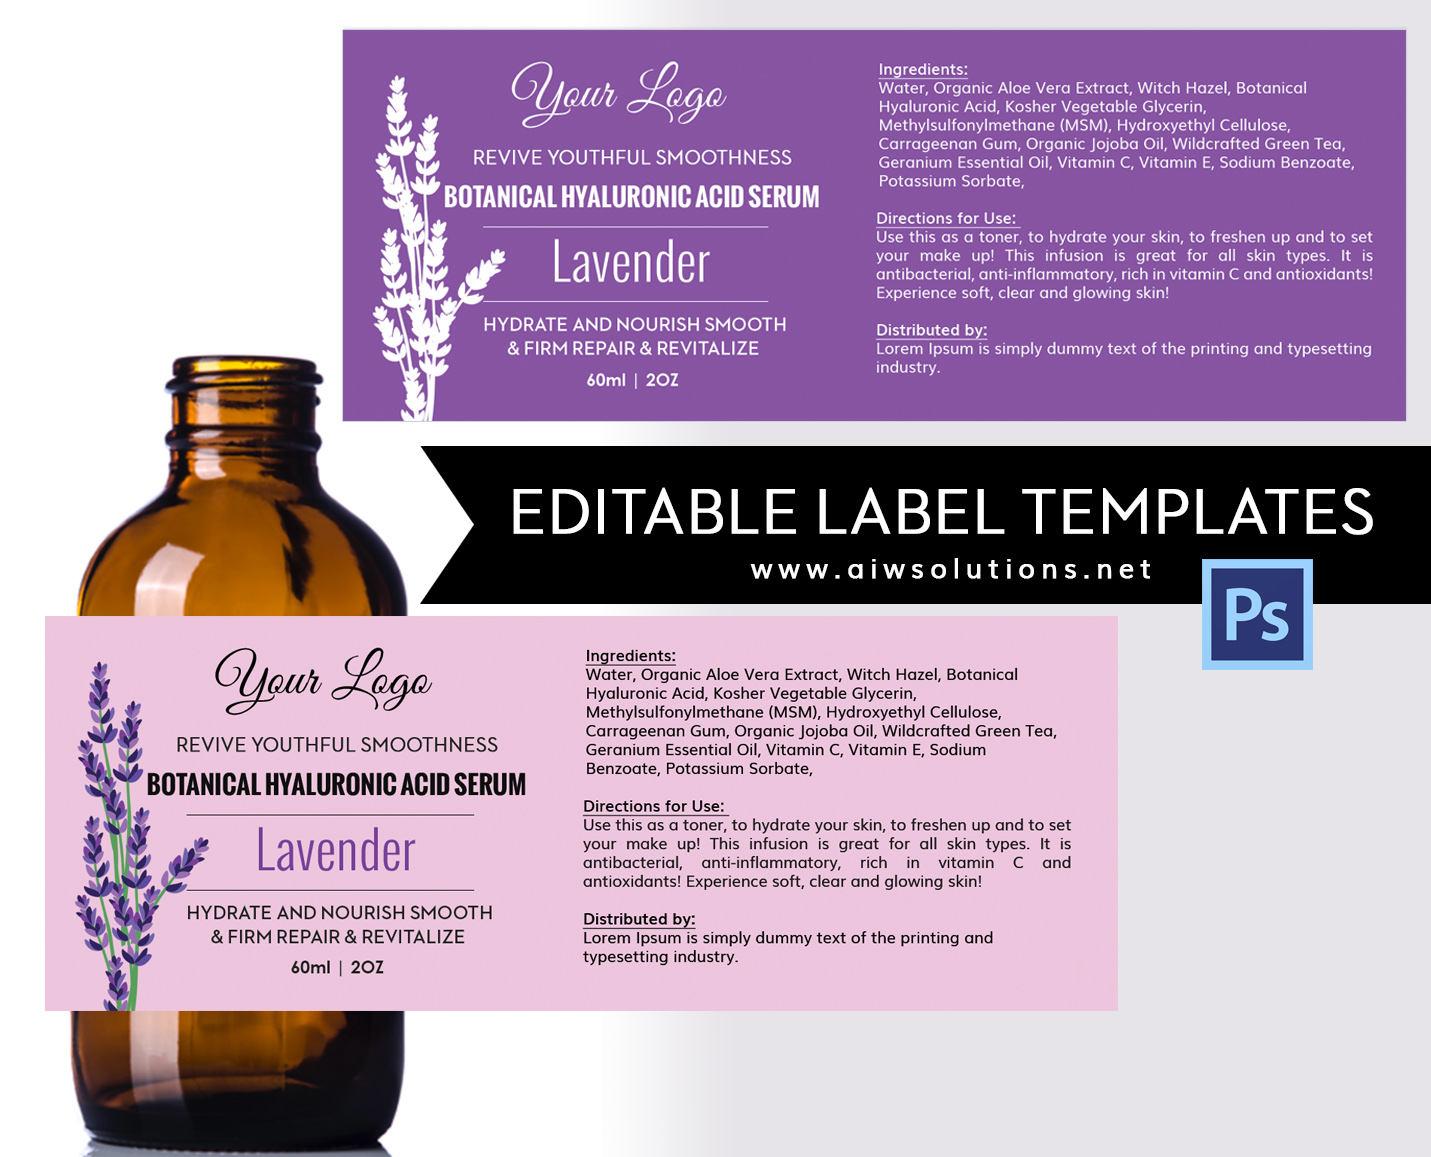 Lavender label template product label Skin Care label | Etsy